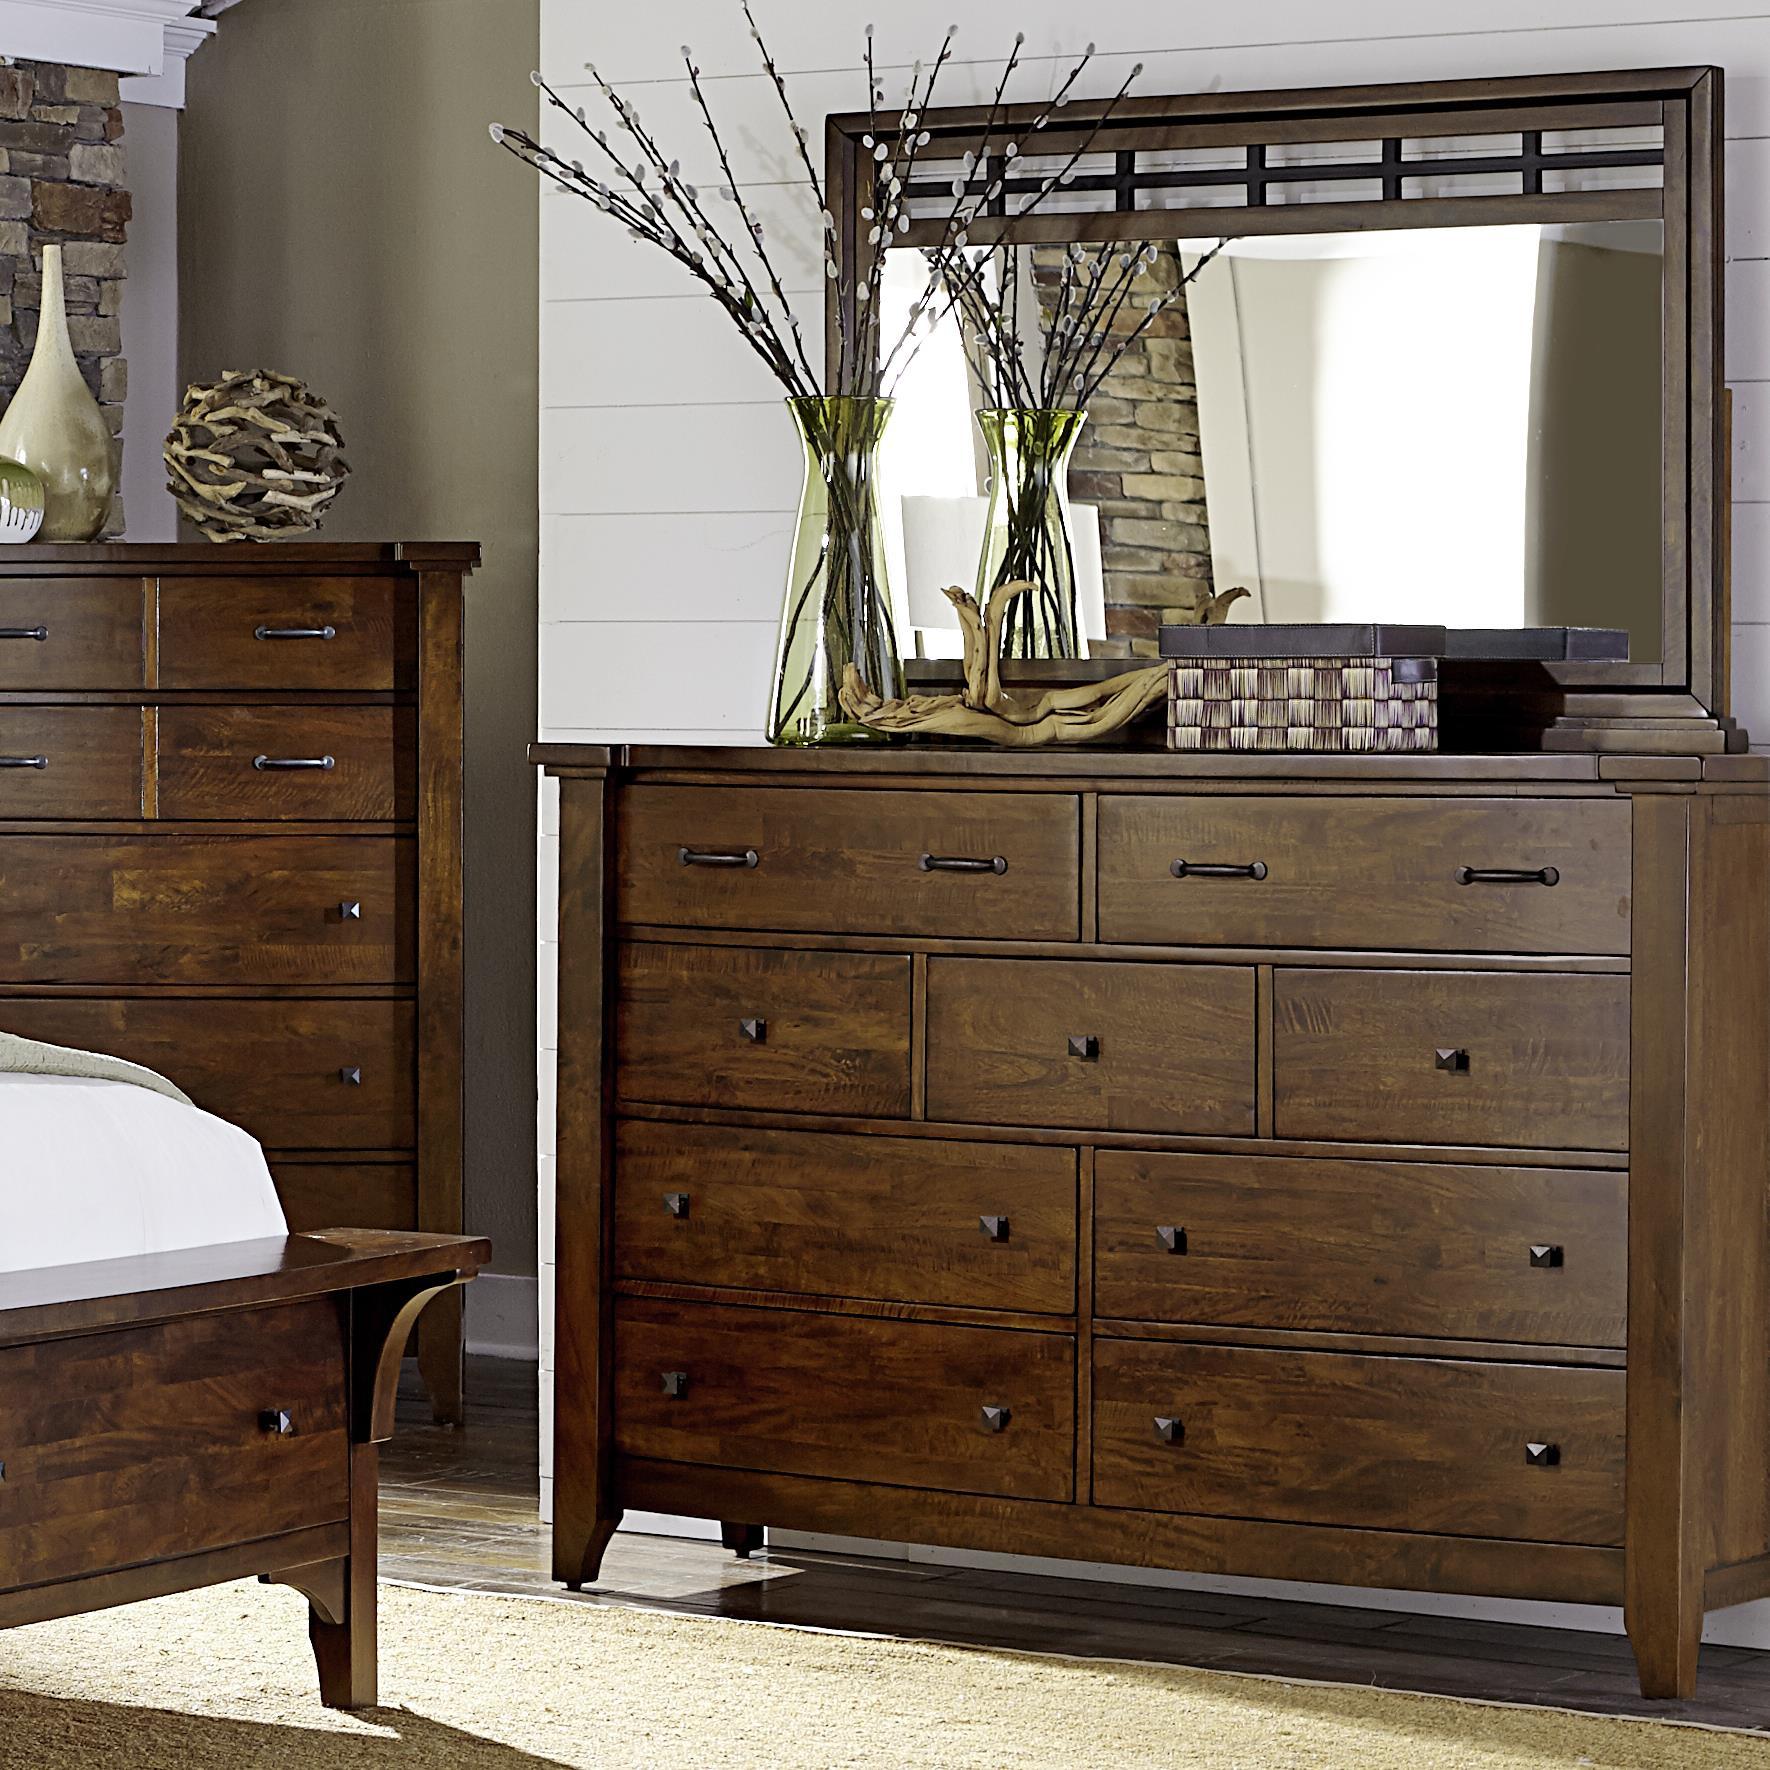 Napa Furniture Designs Whistler Retreat 9 Drawer Chest & Mirror - Item Number: 70-12+14